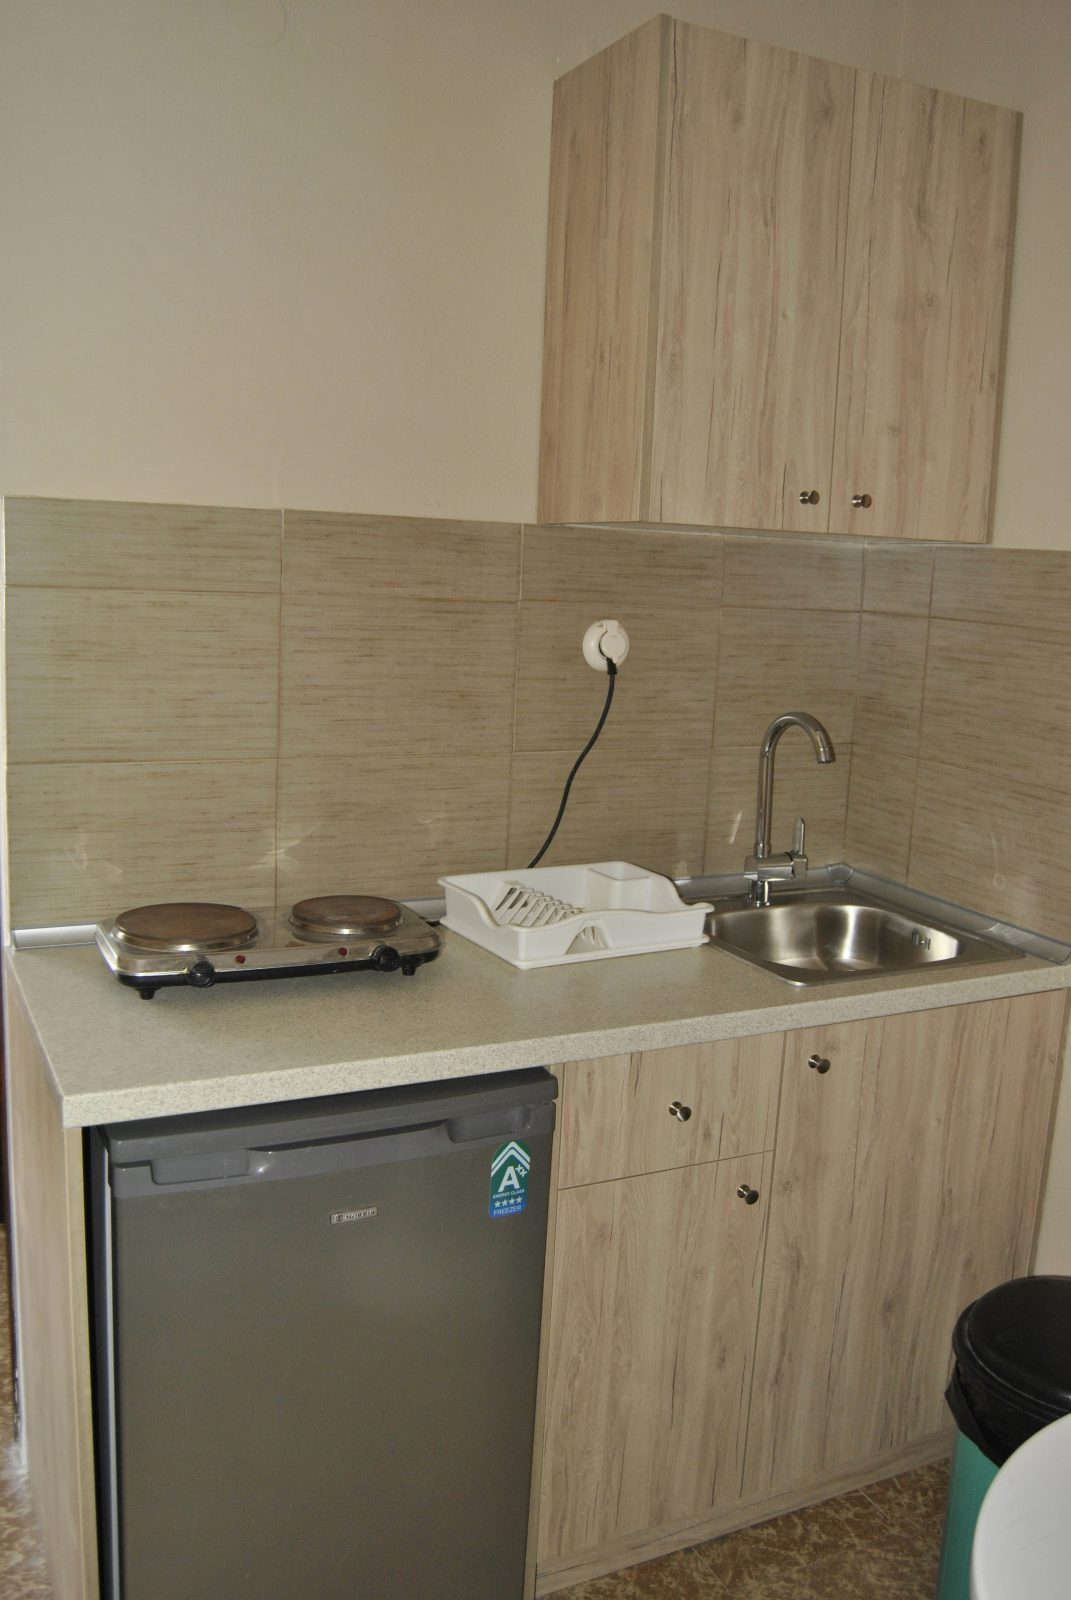 Grcka apartmani letovanje, Nea Flogita Halkidiki, Pirgioti, elementi u kuhinji